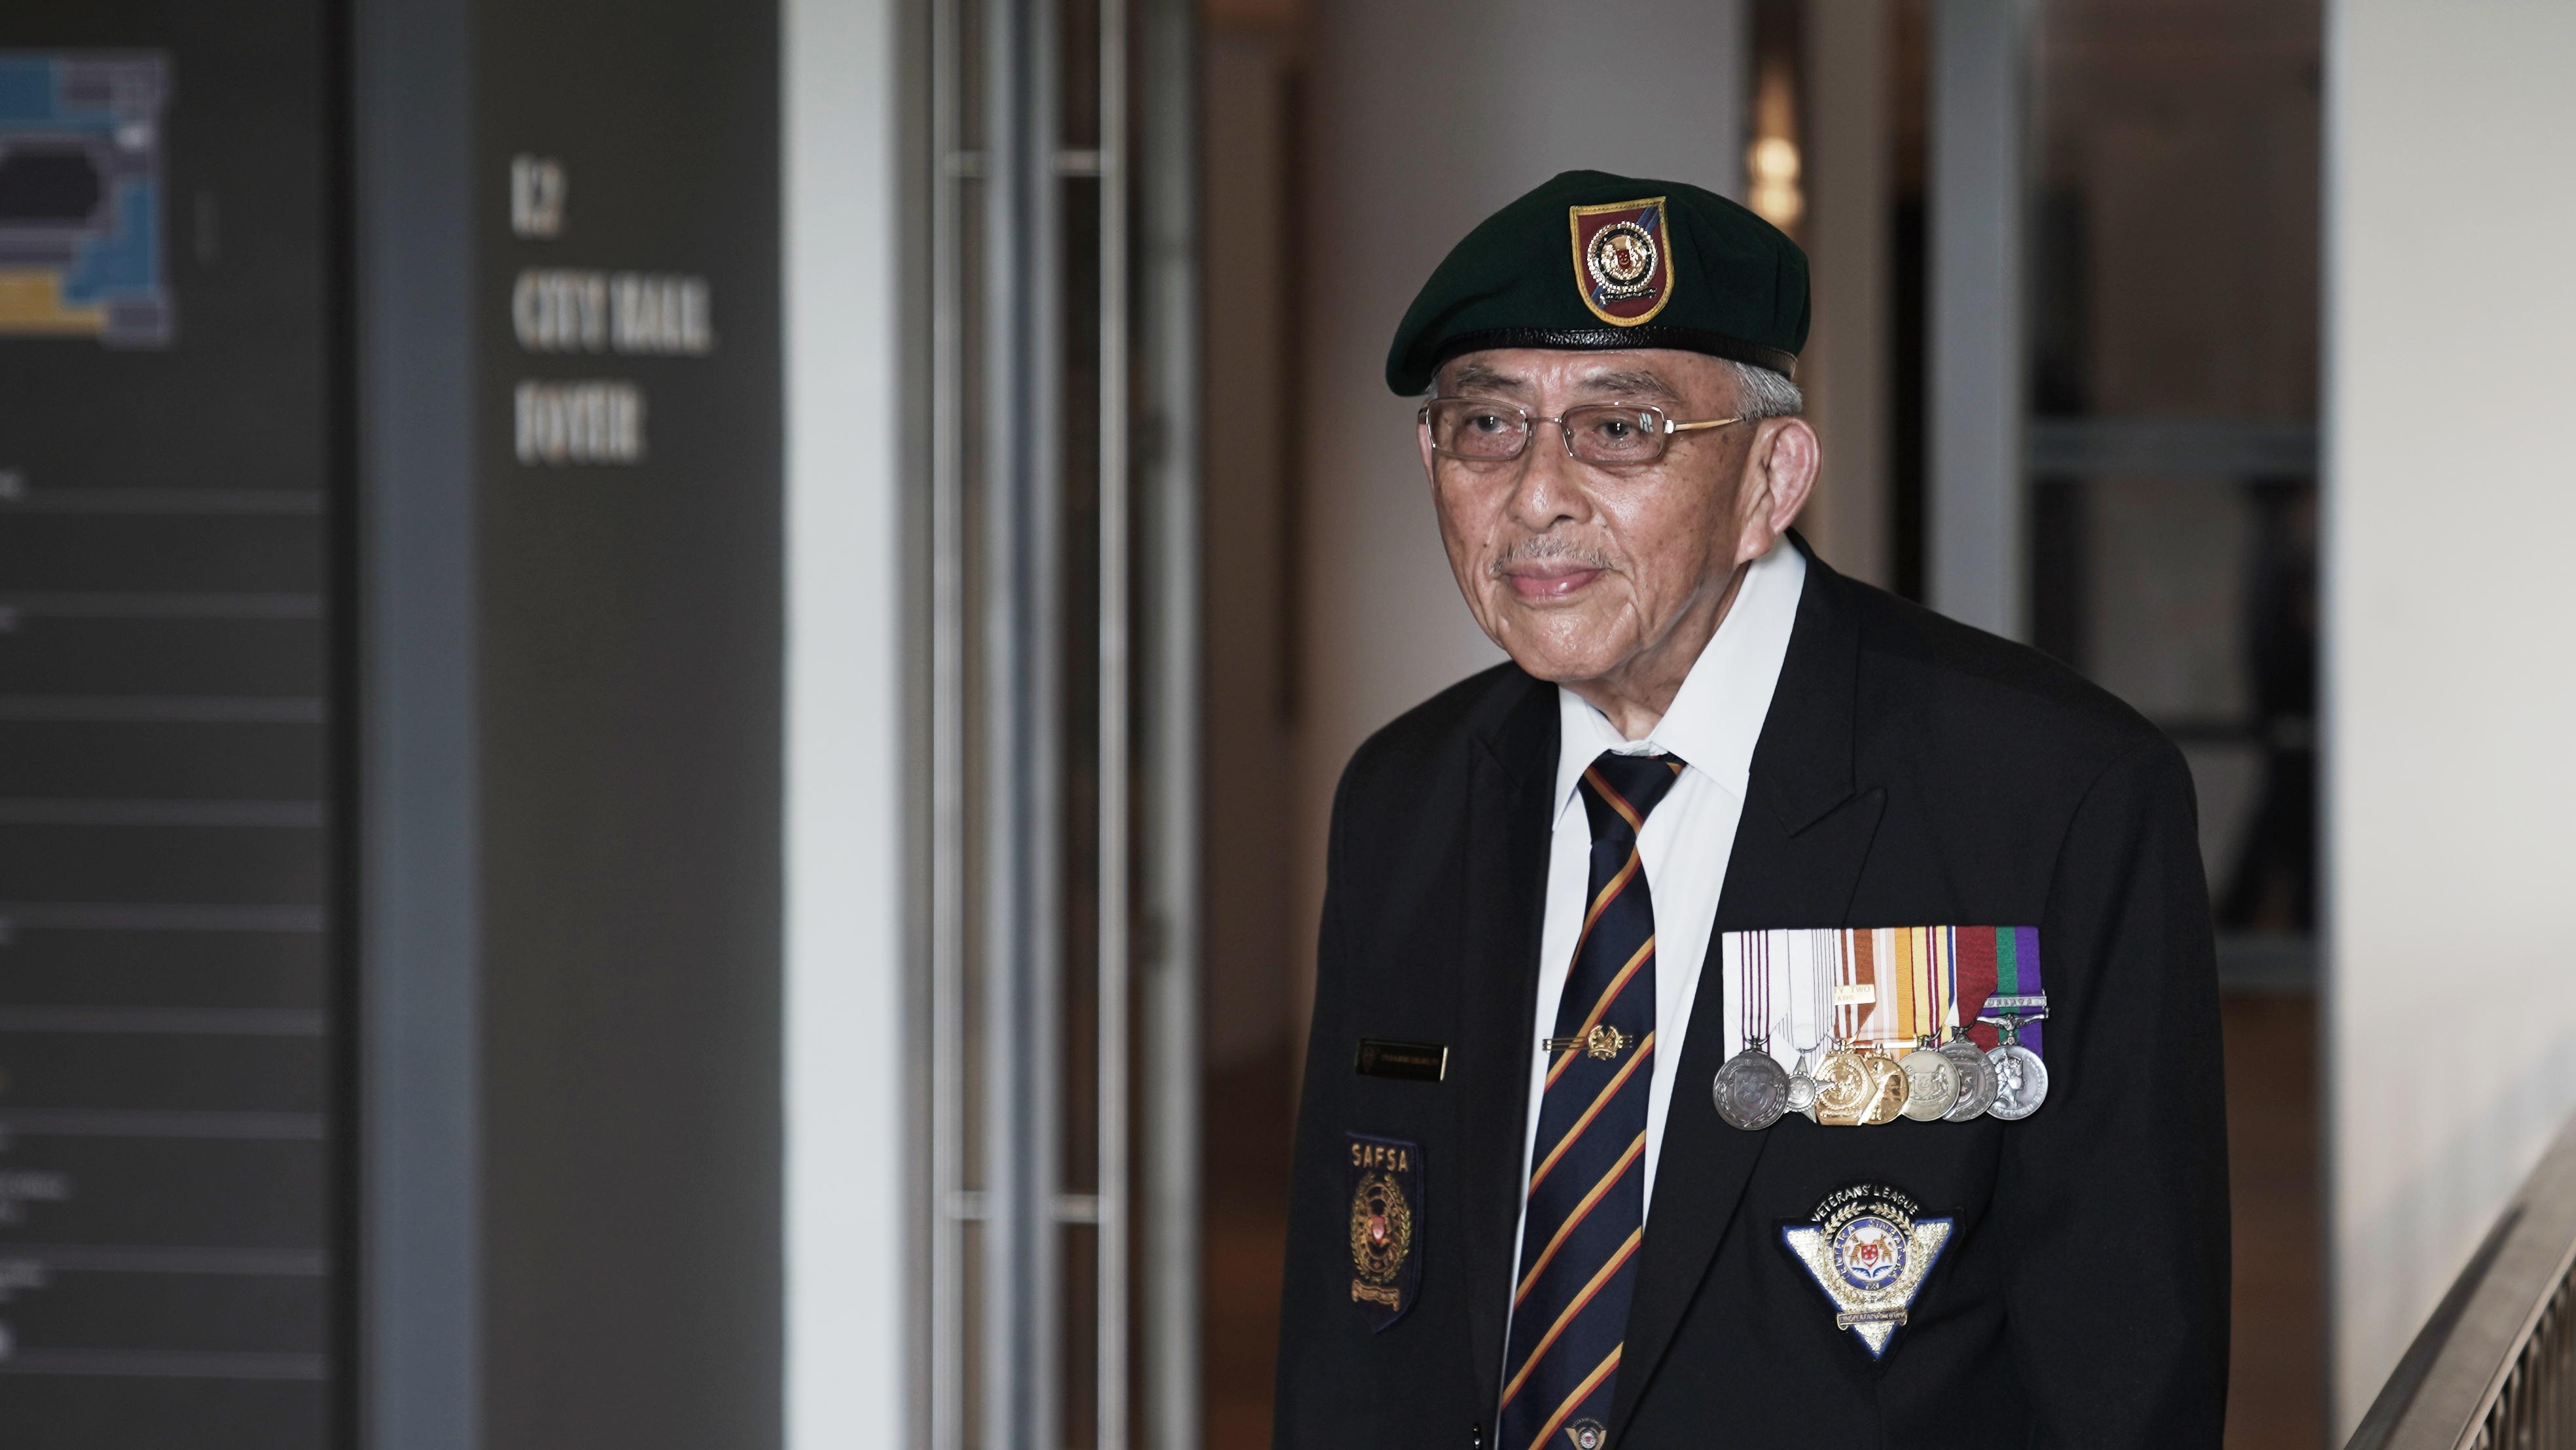 Captain (Ret.) Hong Seng Mak after the flag raising ceremony.